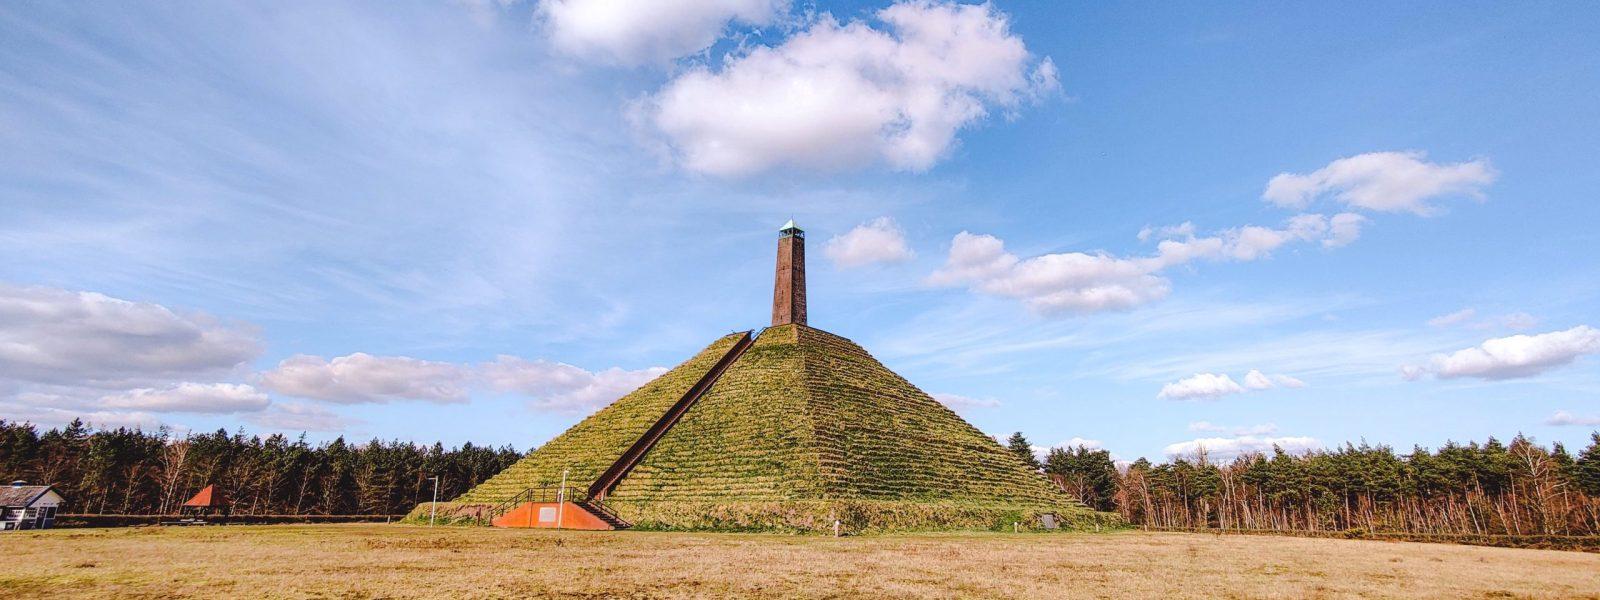 Pyramide van Austerlitz: uniek monument op Utrechtse Heuvelrug